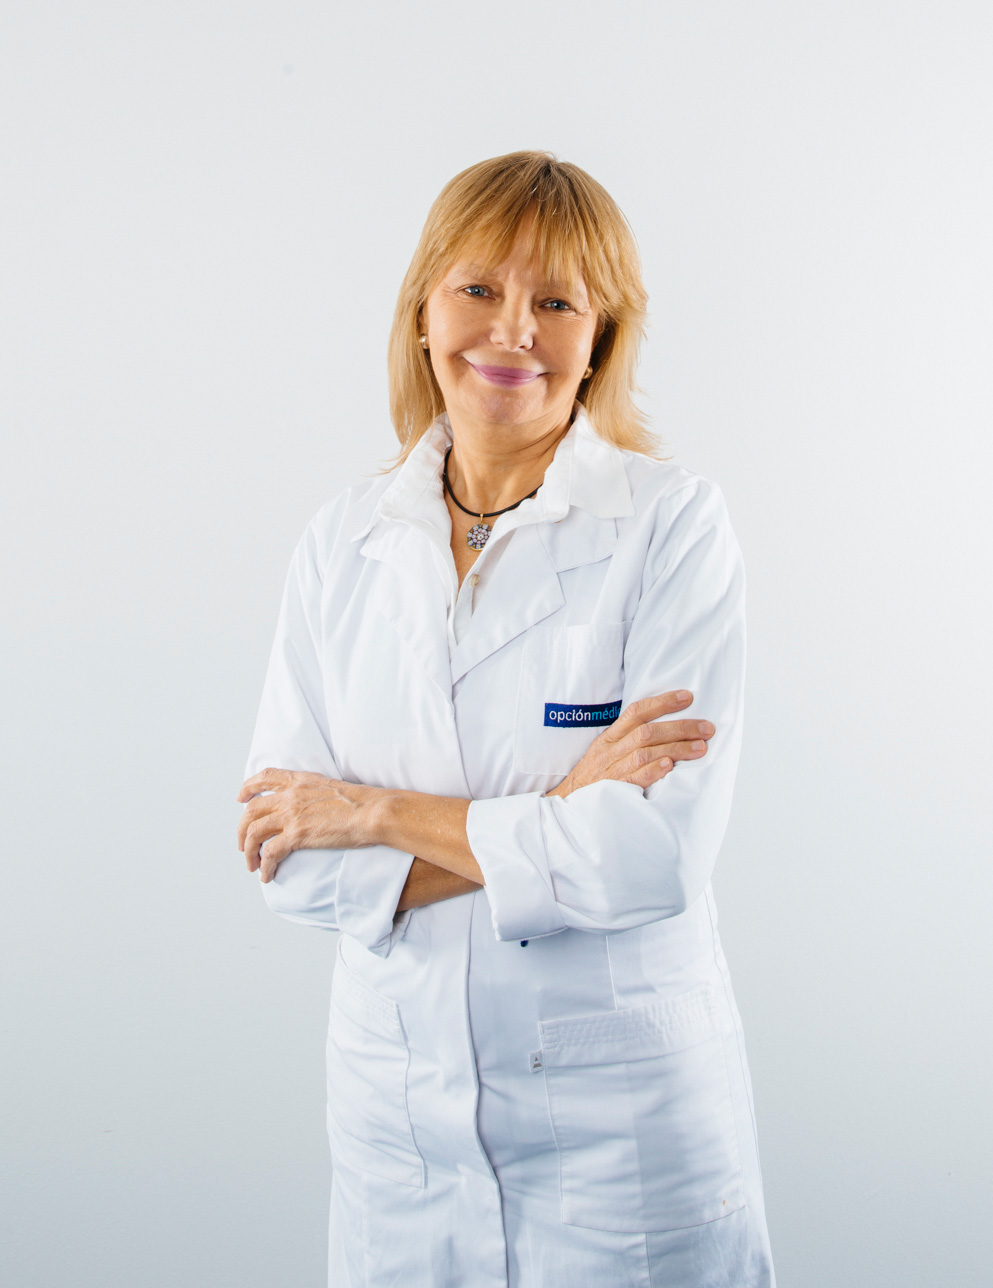 Dra. Maria Lluïsa Giménez